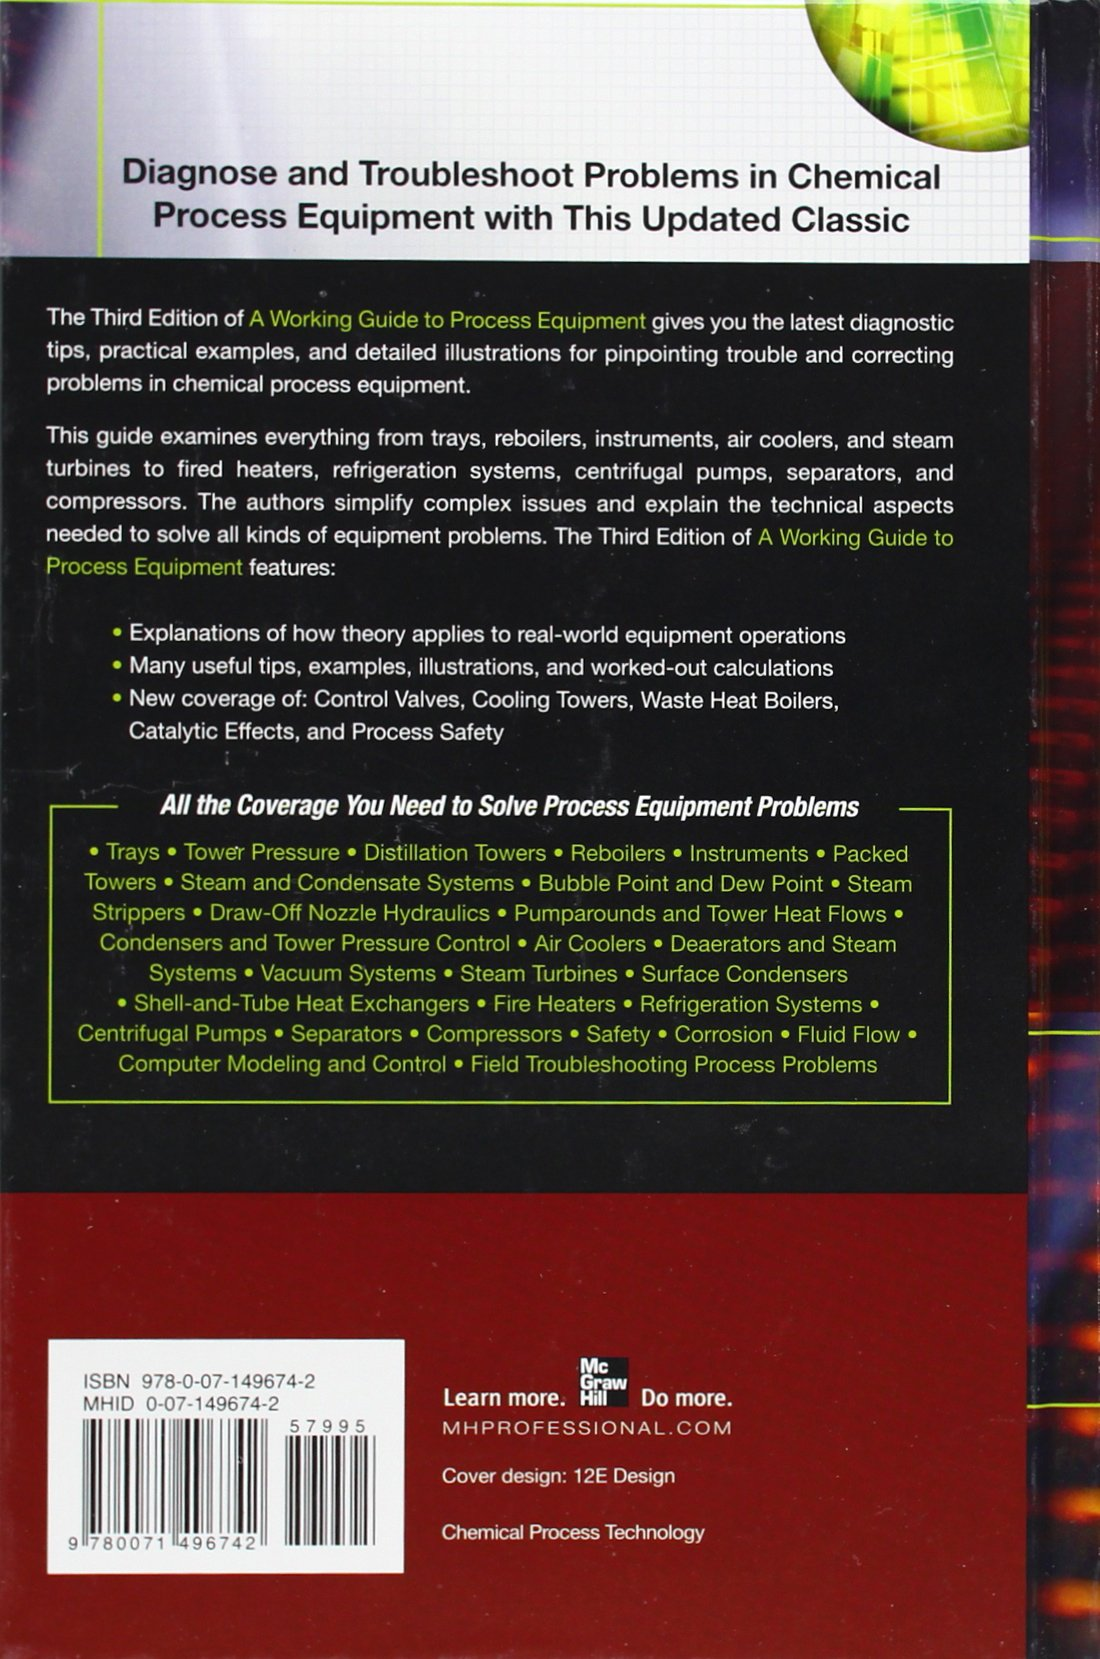 Working Guide to Process Equipment, Third Edition: Norman Lieberman,  Elizabeth Lieberman: 9780071496742: Books - Amazon.ca